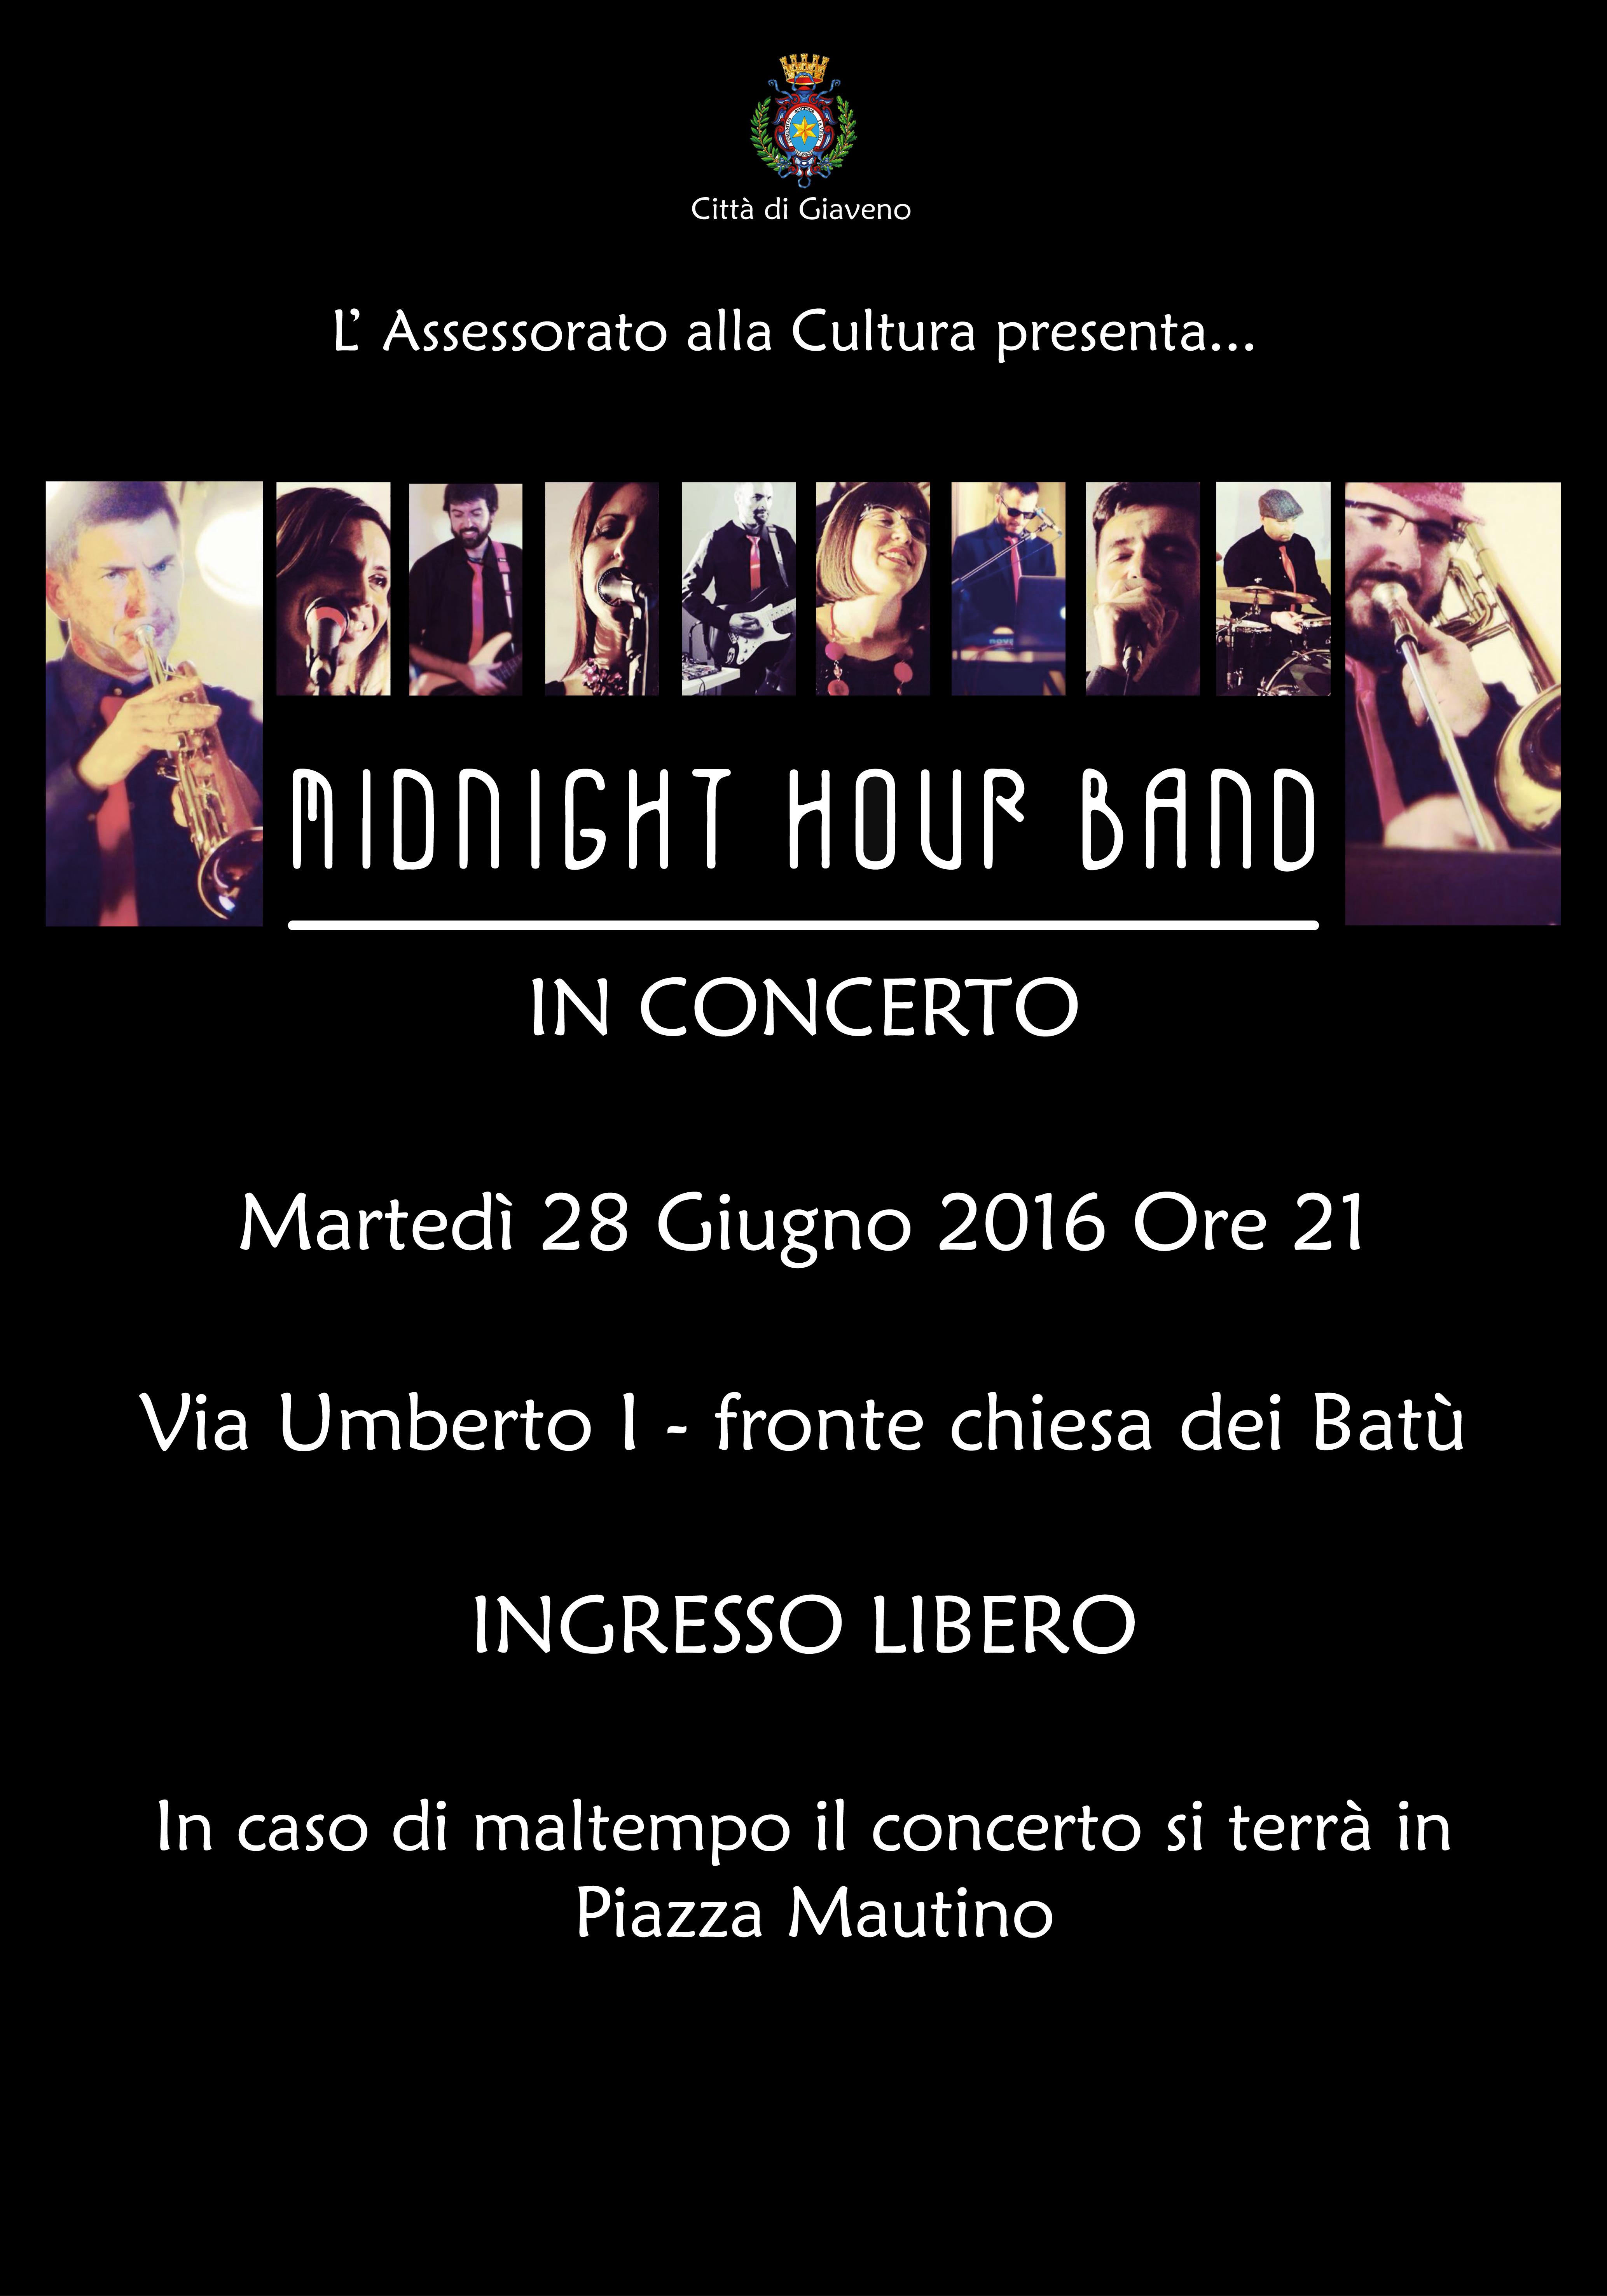 Midnight Hour Band  – Concerto di martedì 28 giugno 2016